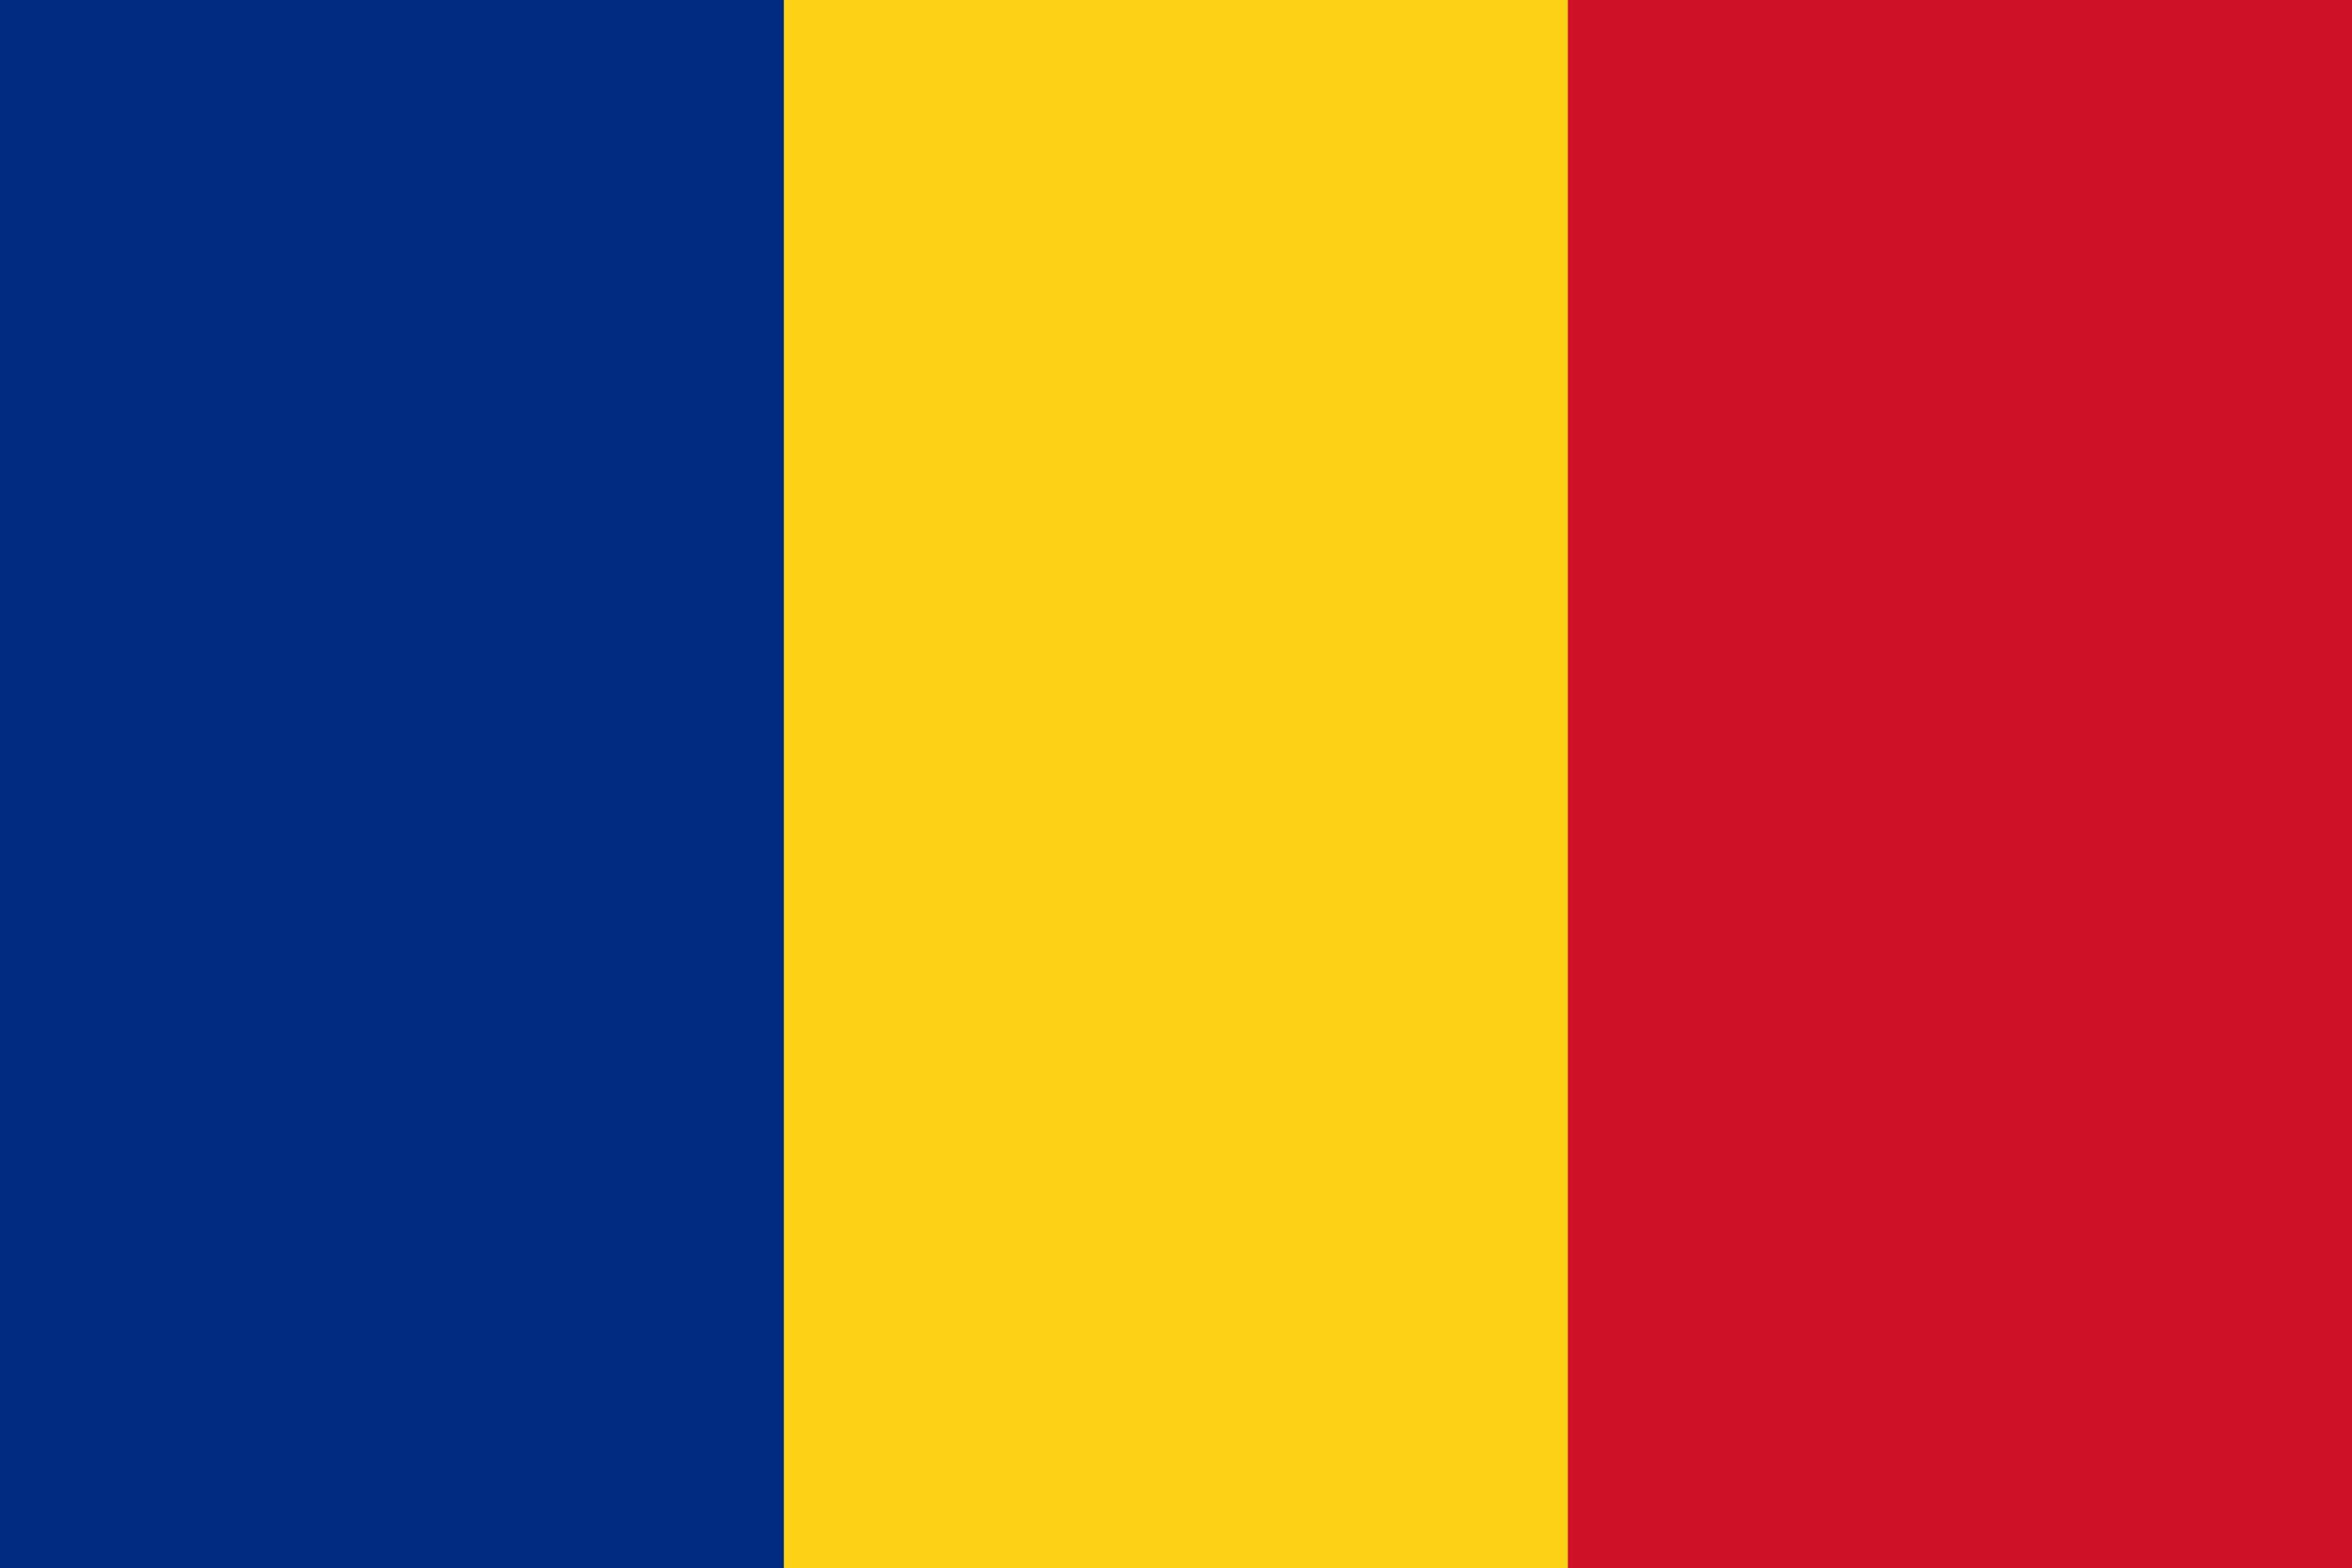 rumania, 国家, 会徽, 徽标, 符号 - 高清壁纸 - 教授-falken.com